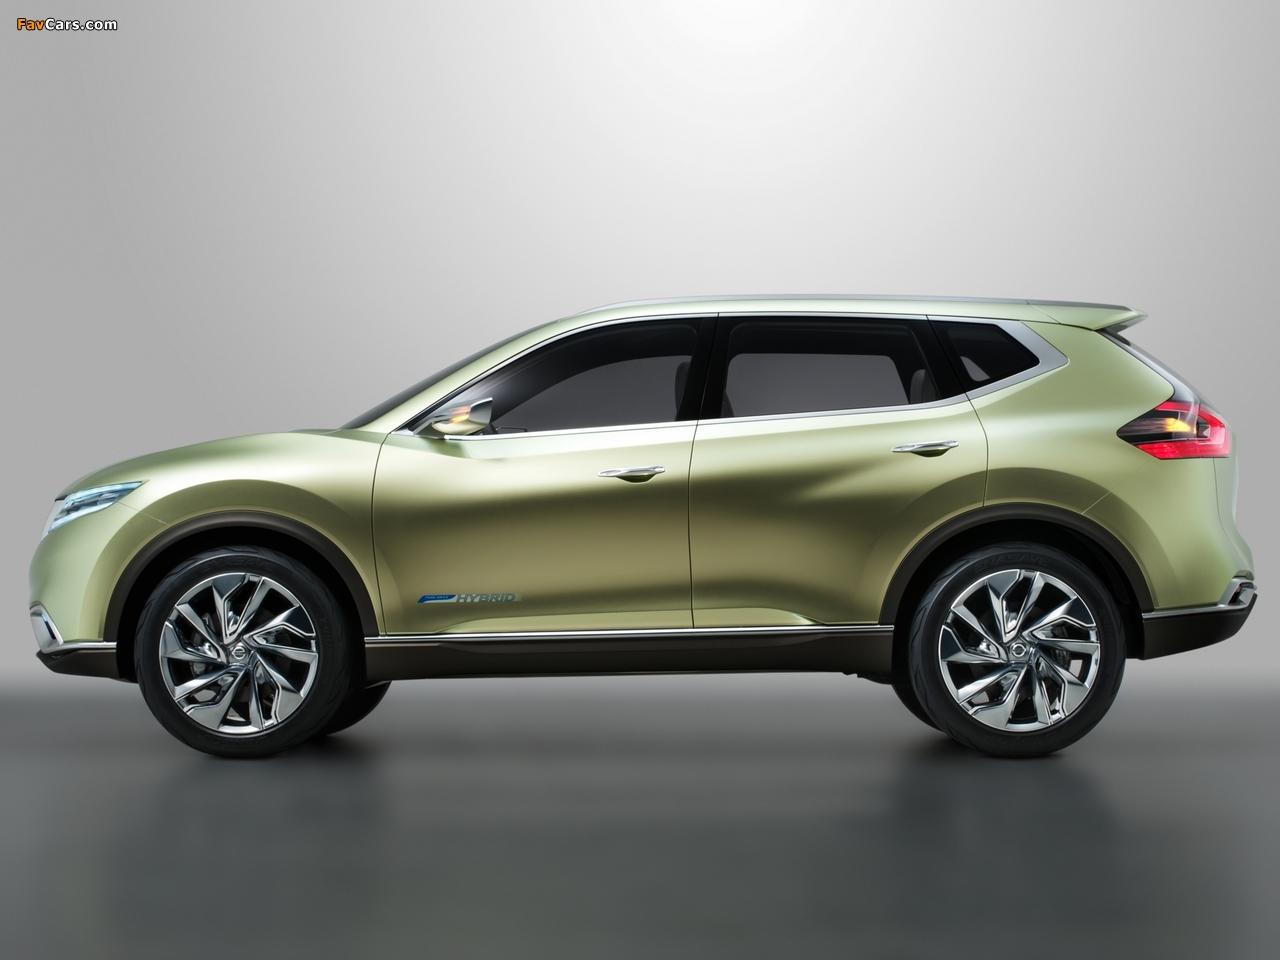 Nissan Hi-Cross Concept 2012 photos (1280 x 960)